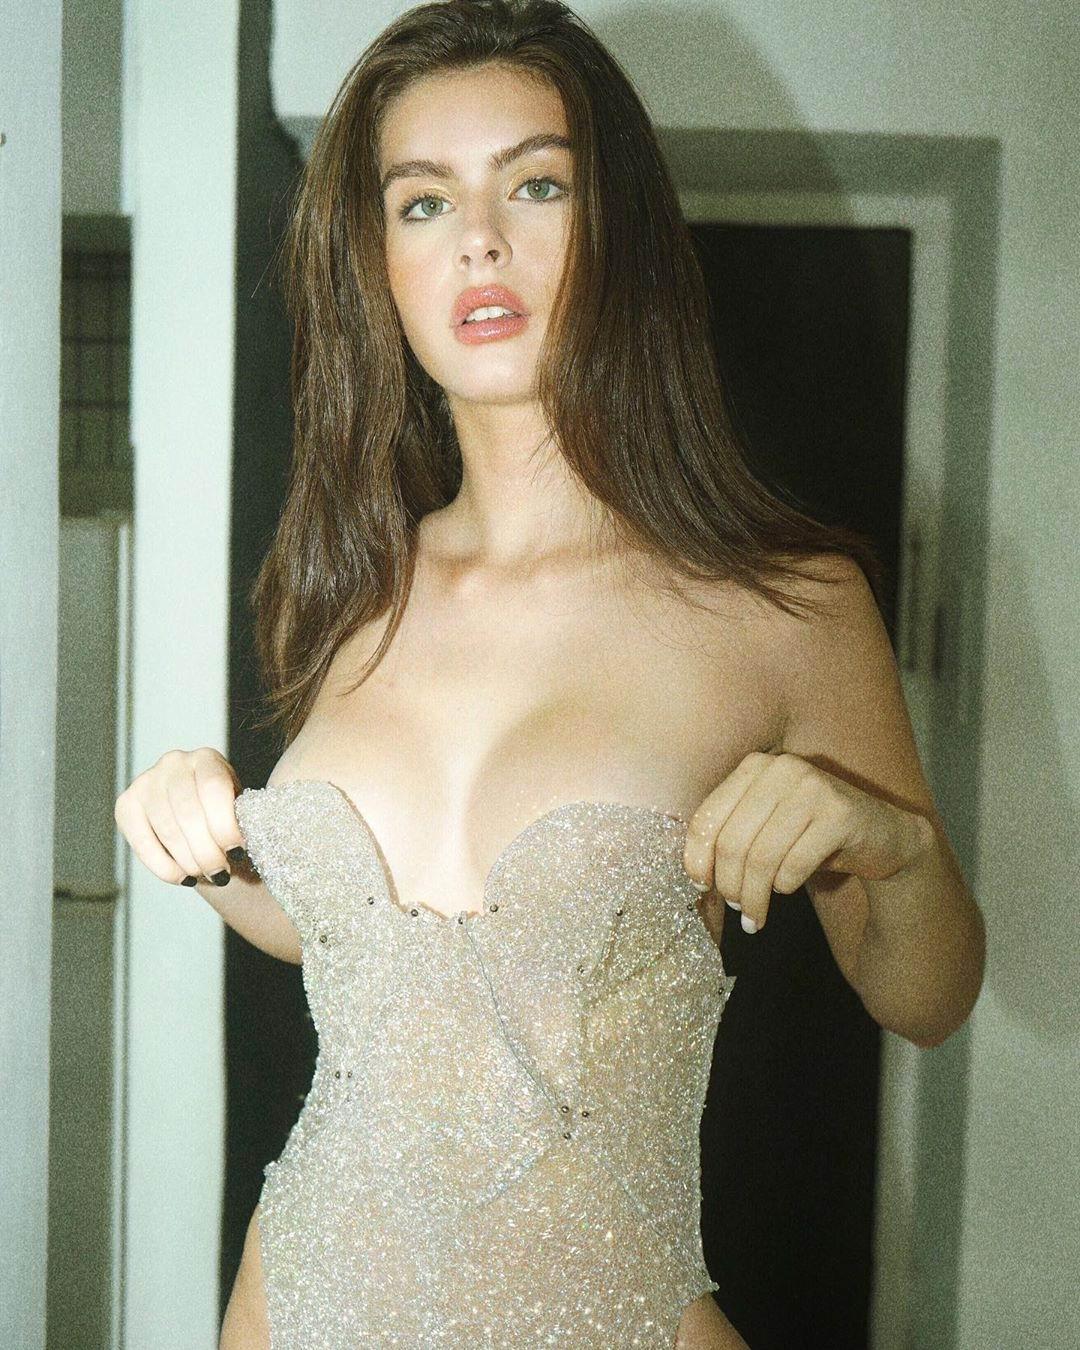 Эскорт модель Марьяна